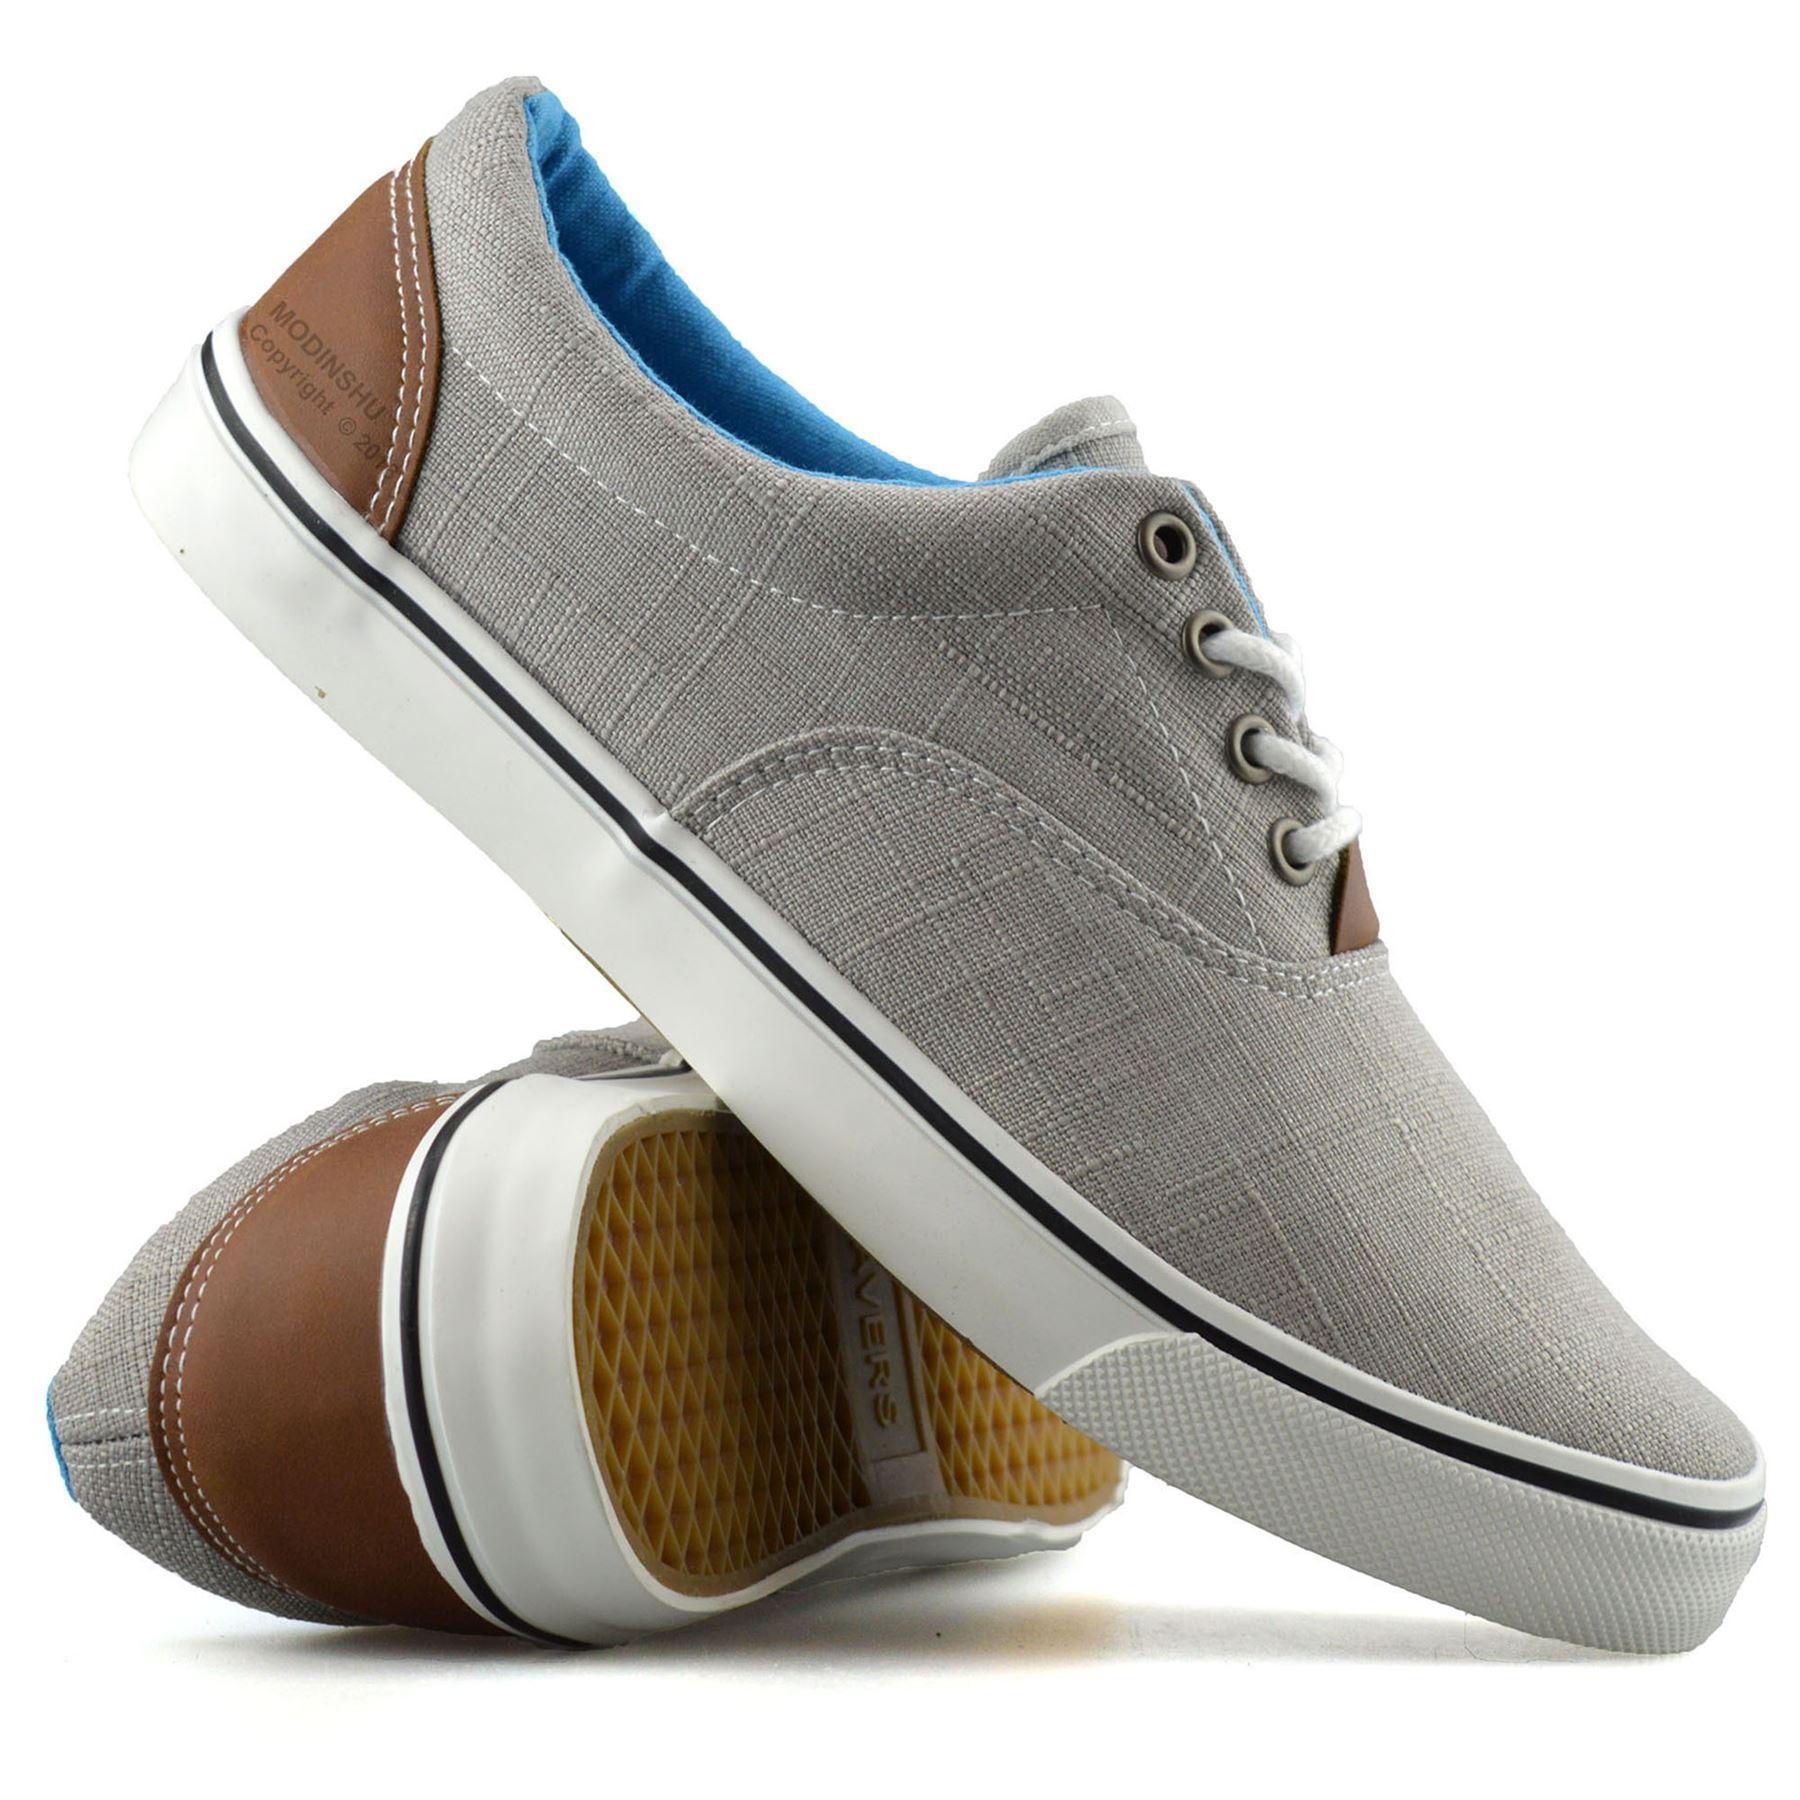 Mens-Casual-Flat-Lace-Up-Canvas-Skate-Pumps-Walking-Plimsolls-Trainers-Shoe-Size thumbnail 21